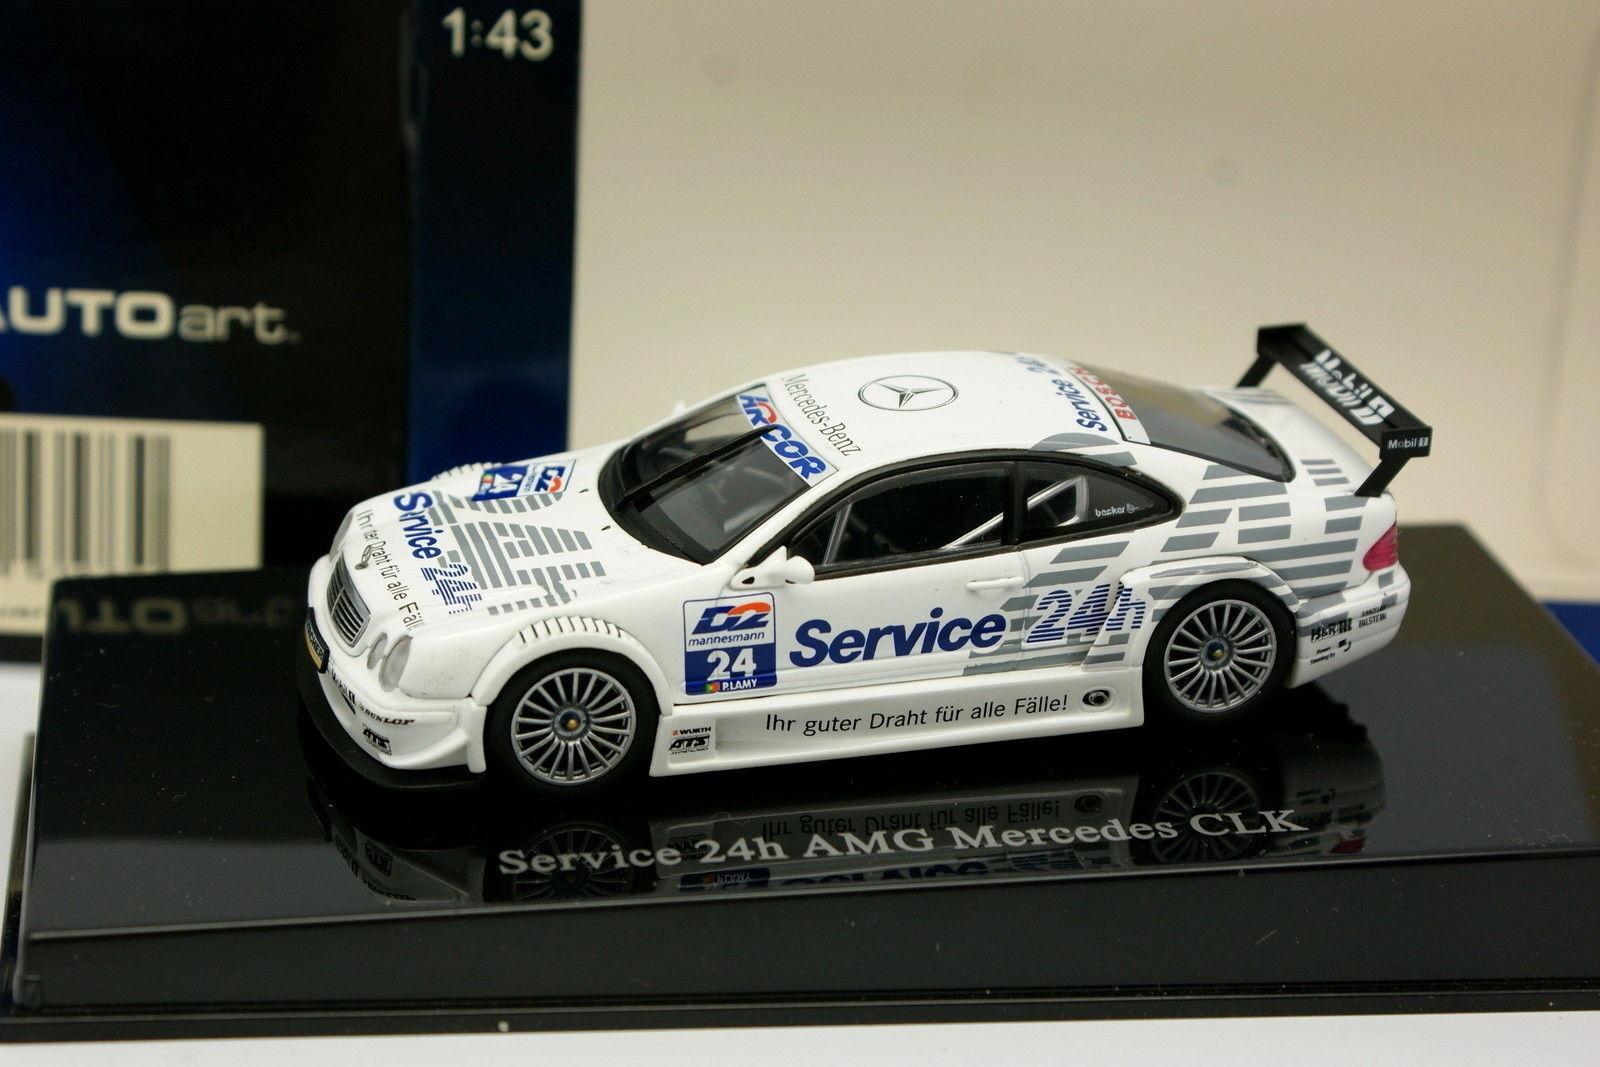 Auto Art 1 43 - Mercedes AMG AMG AMG CLK DTM Servizio 24H af2fc8